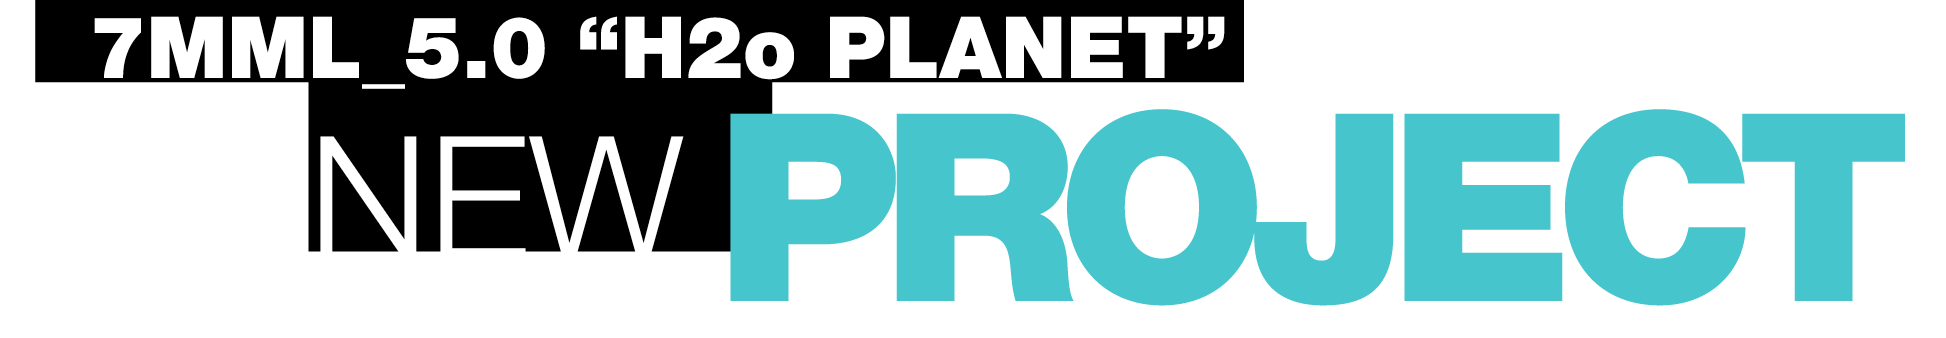 "7MML.World 5.0 ""H2o PLANET"""